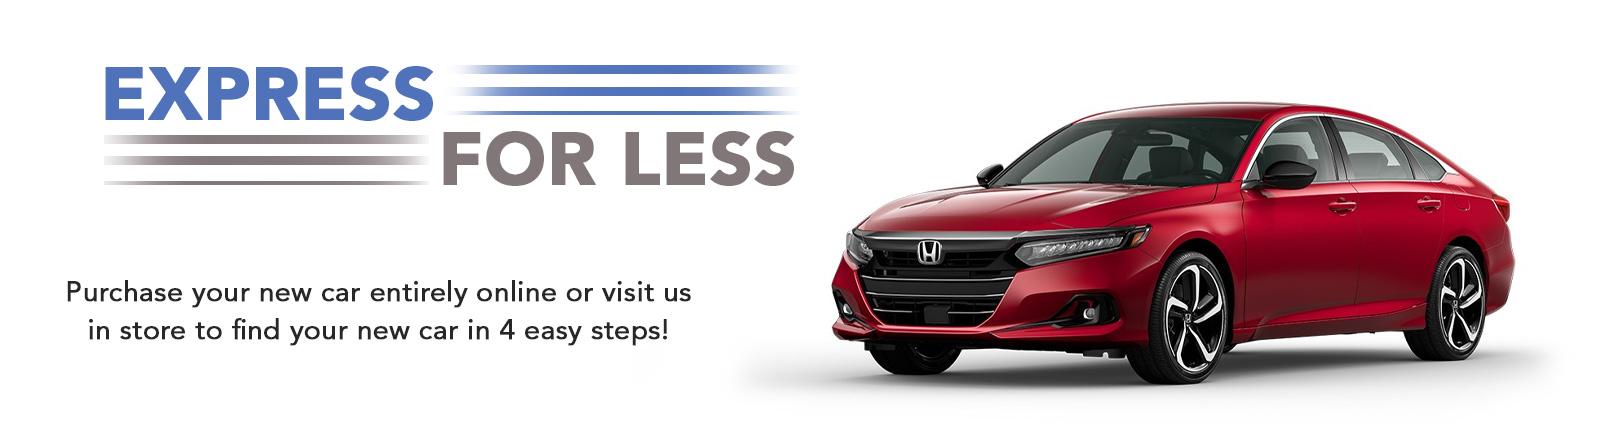 Largo Honda Express For Less